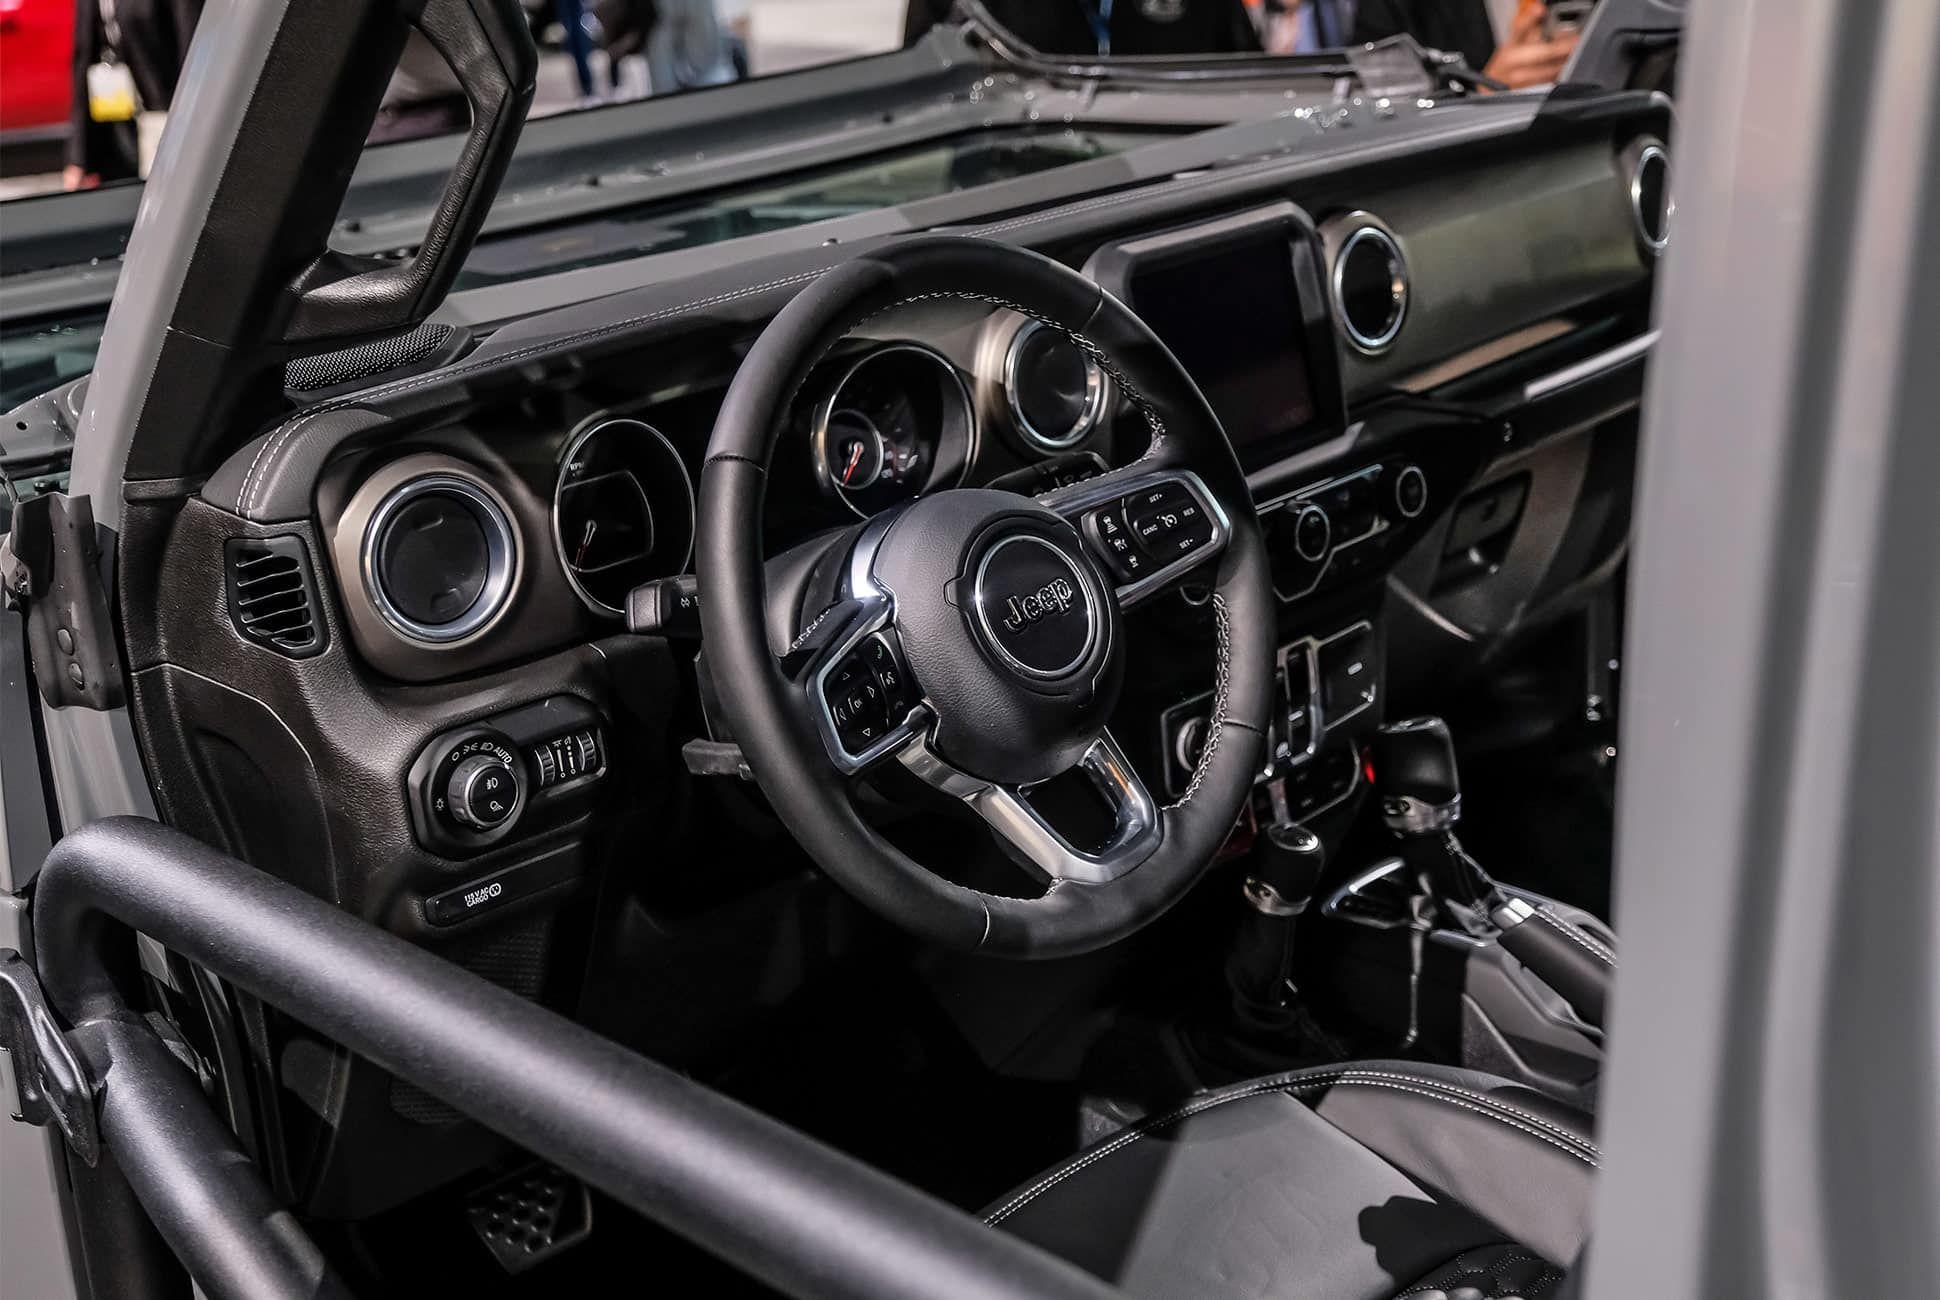 Top-10-LA-Auto-Show-Cars-gear-patrol-Jeep-Gladiator-slide-5